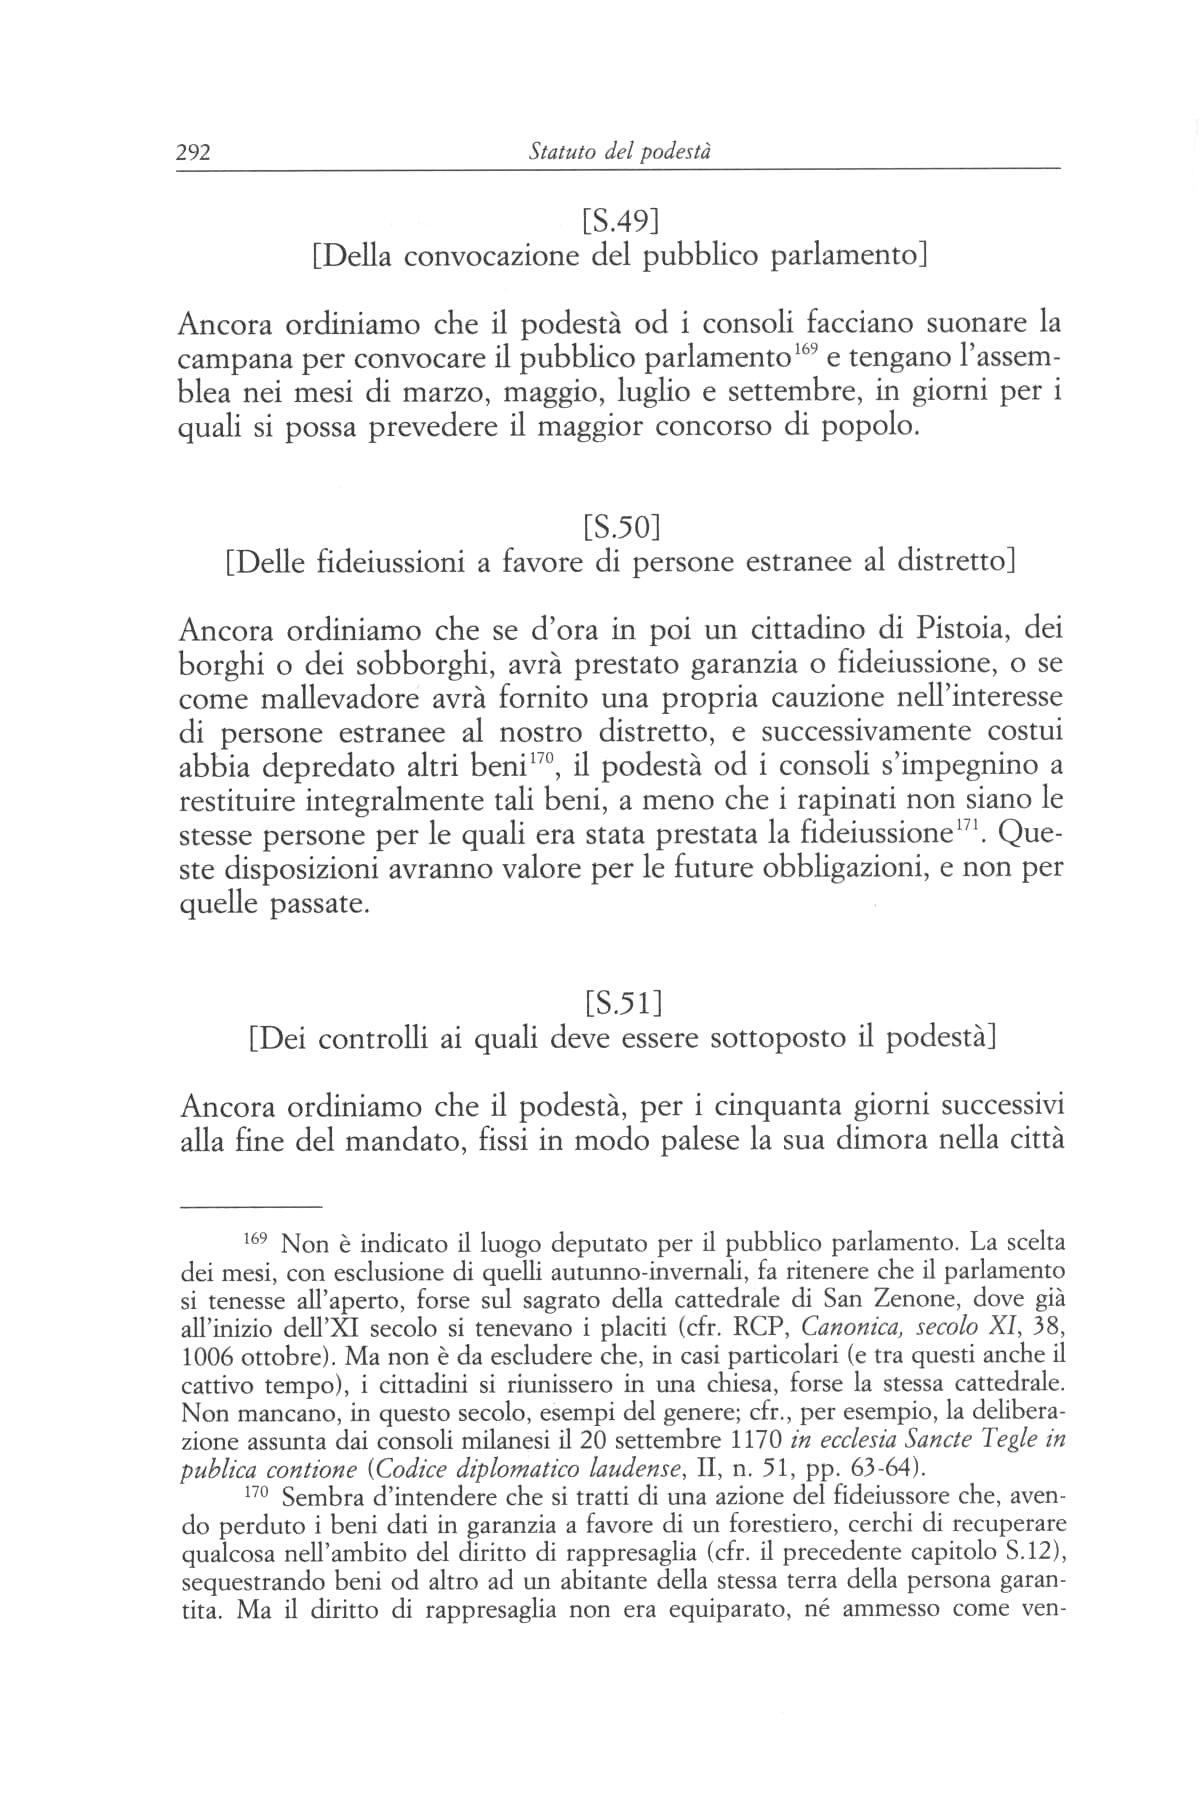 statuti pistoiesi del sec.XII 0292.jpg